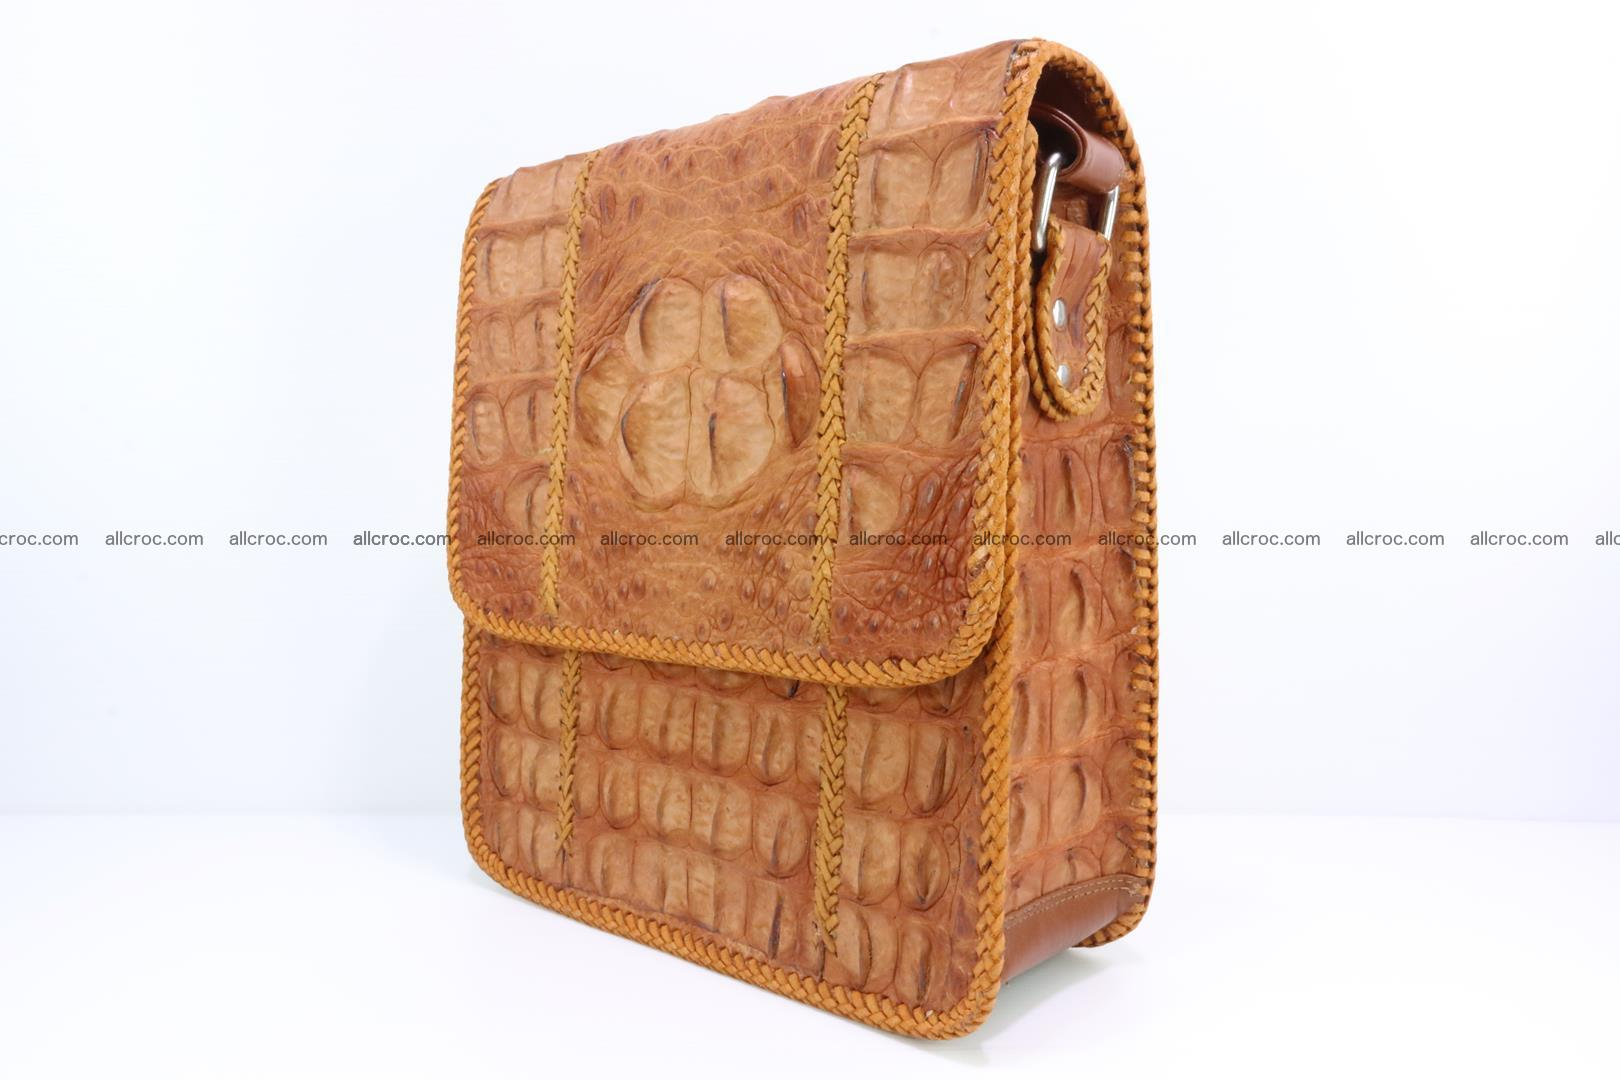 Сrocodile skin shoulder bag with braided edges 141 Foto 2